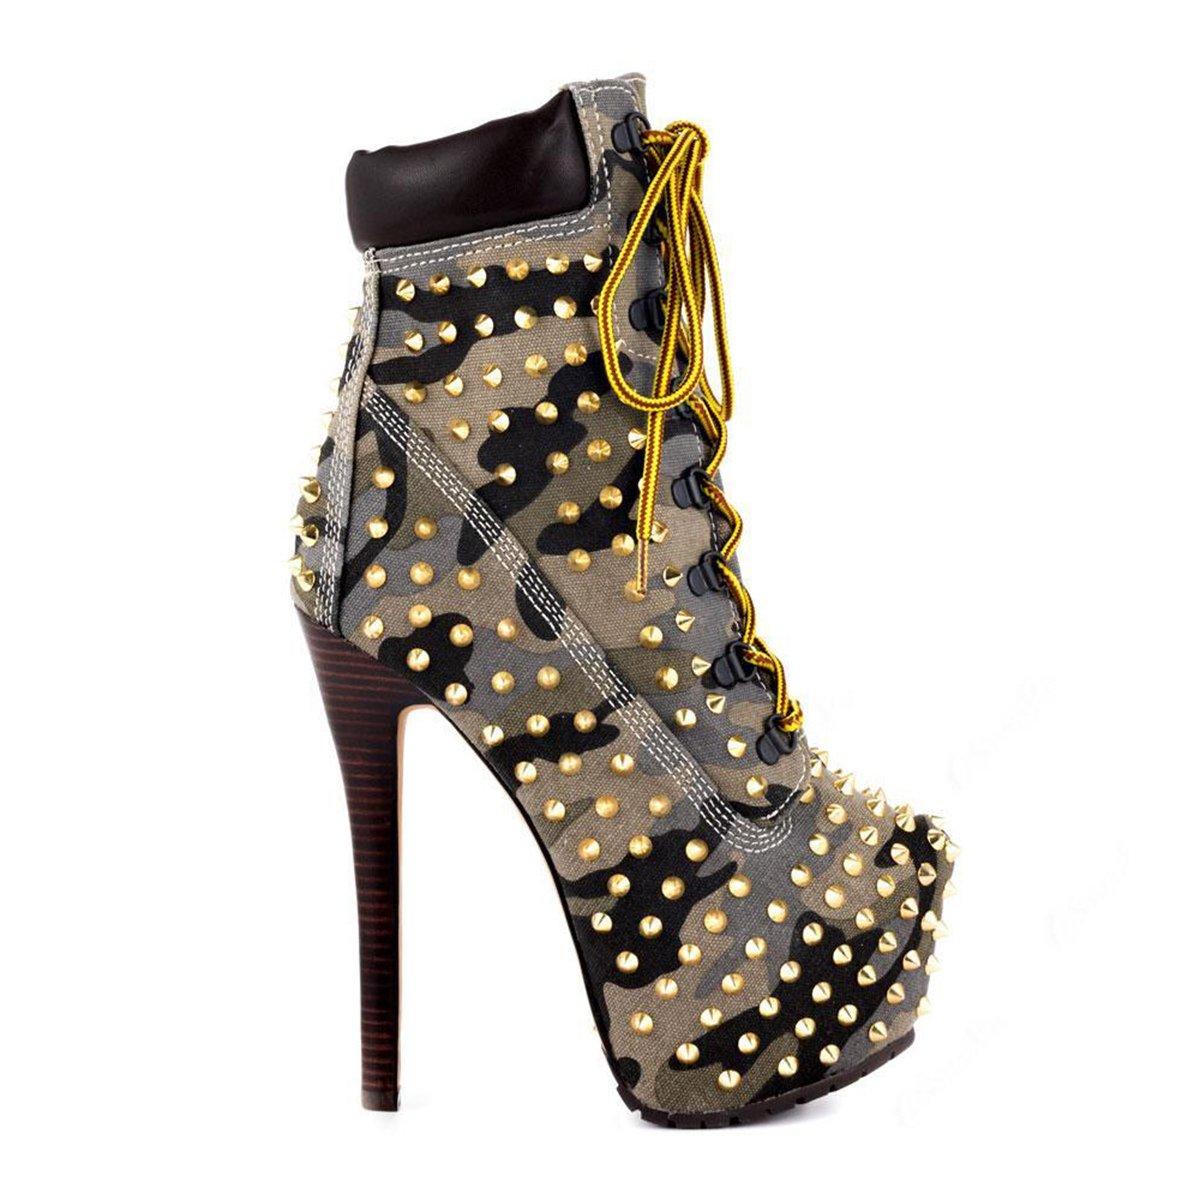 56e953060fd ... onlymaker Women s Women s Women s Rivet Studded Platform High Heel  Pointed Toe Lace up Ankle Boots B013FLX6GA ...